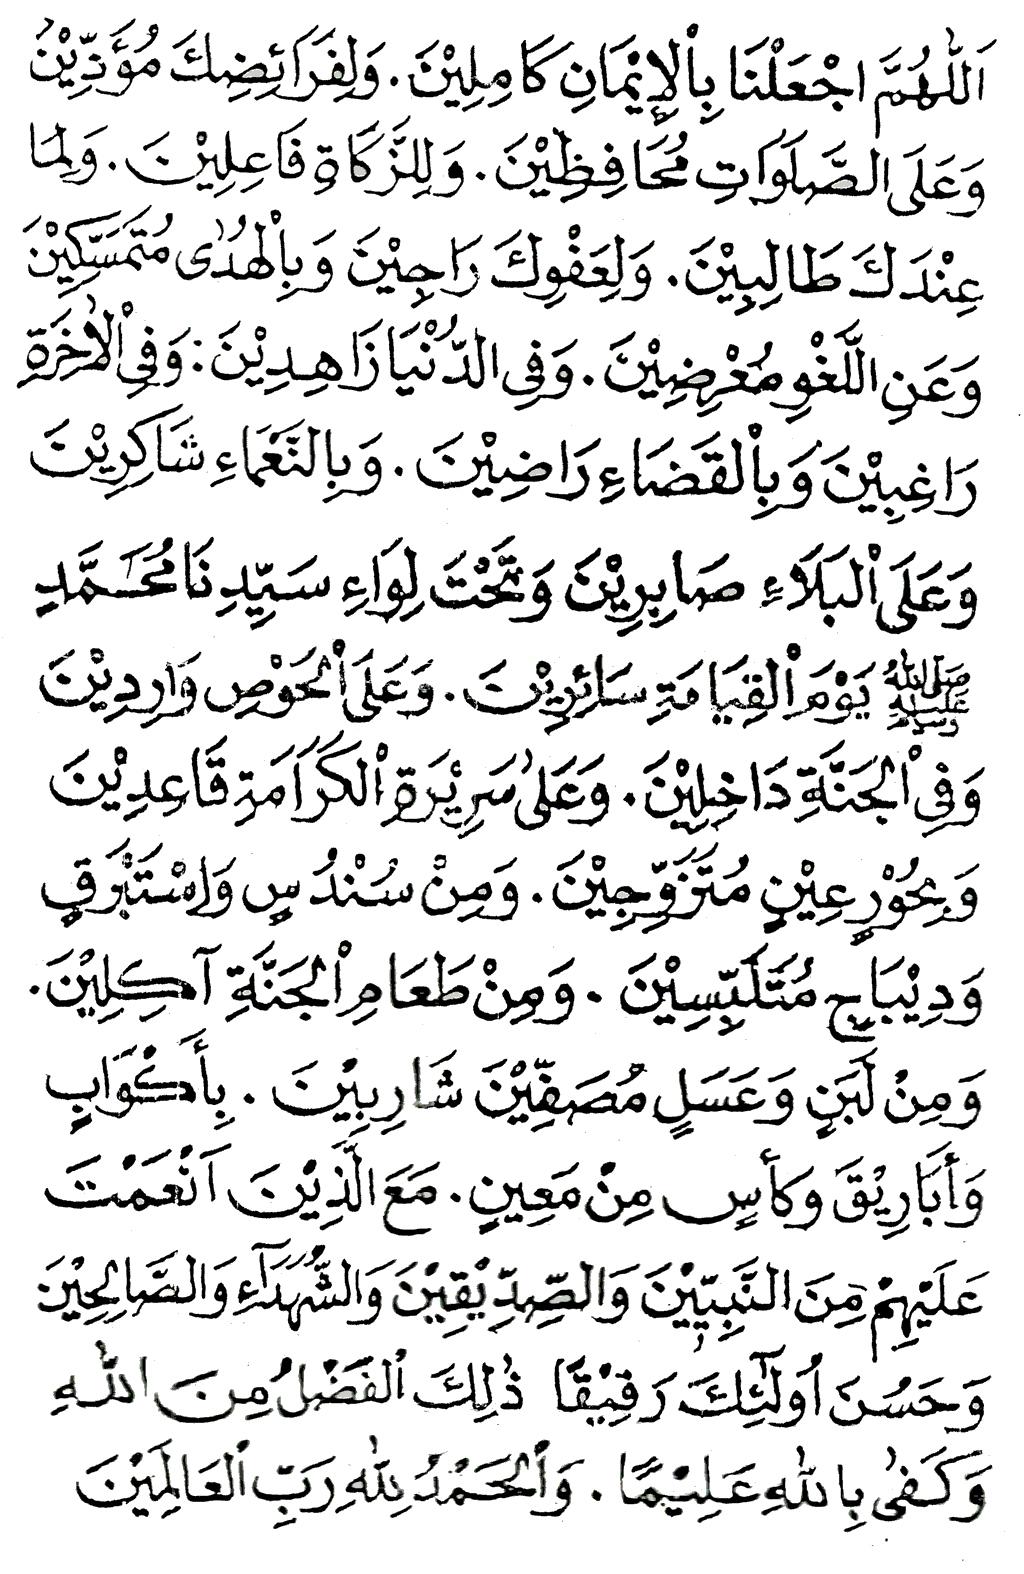 Doa Witir Setelah Sholat Tarawih : witir, setelah, sholat, tarawih, Setelah, Sholat, Tarawih, Beserta, Artinya